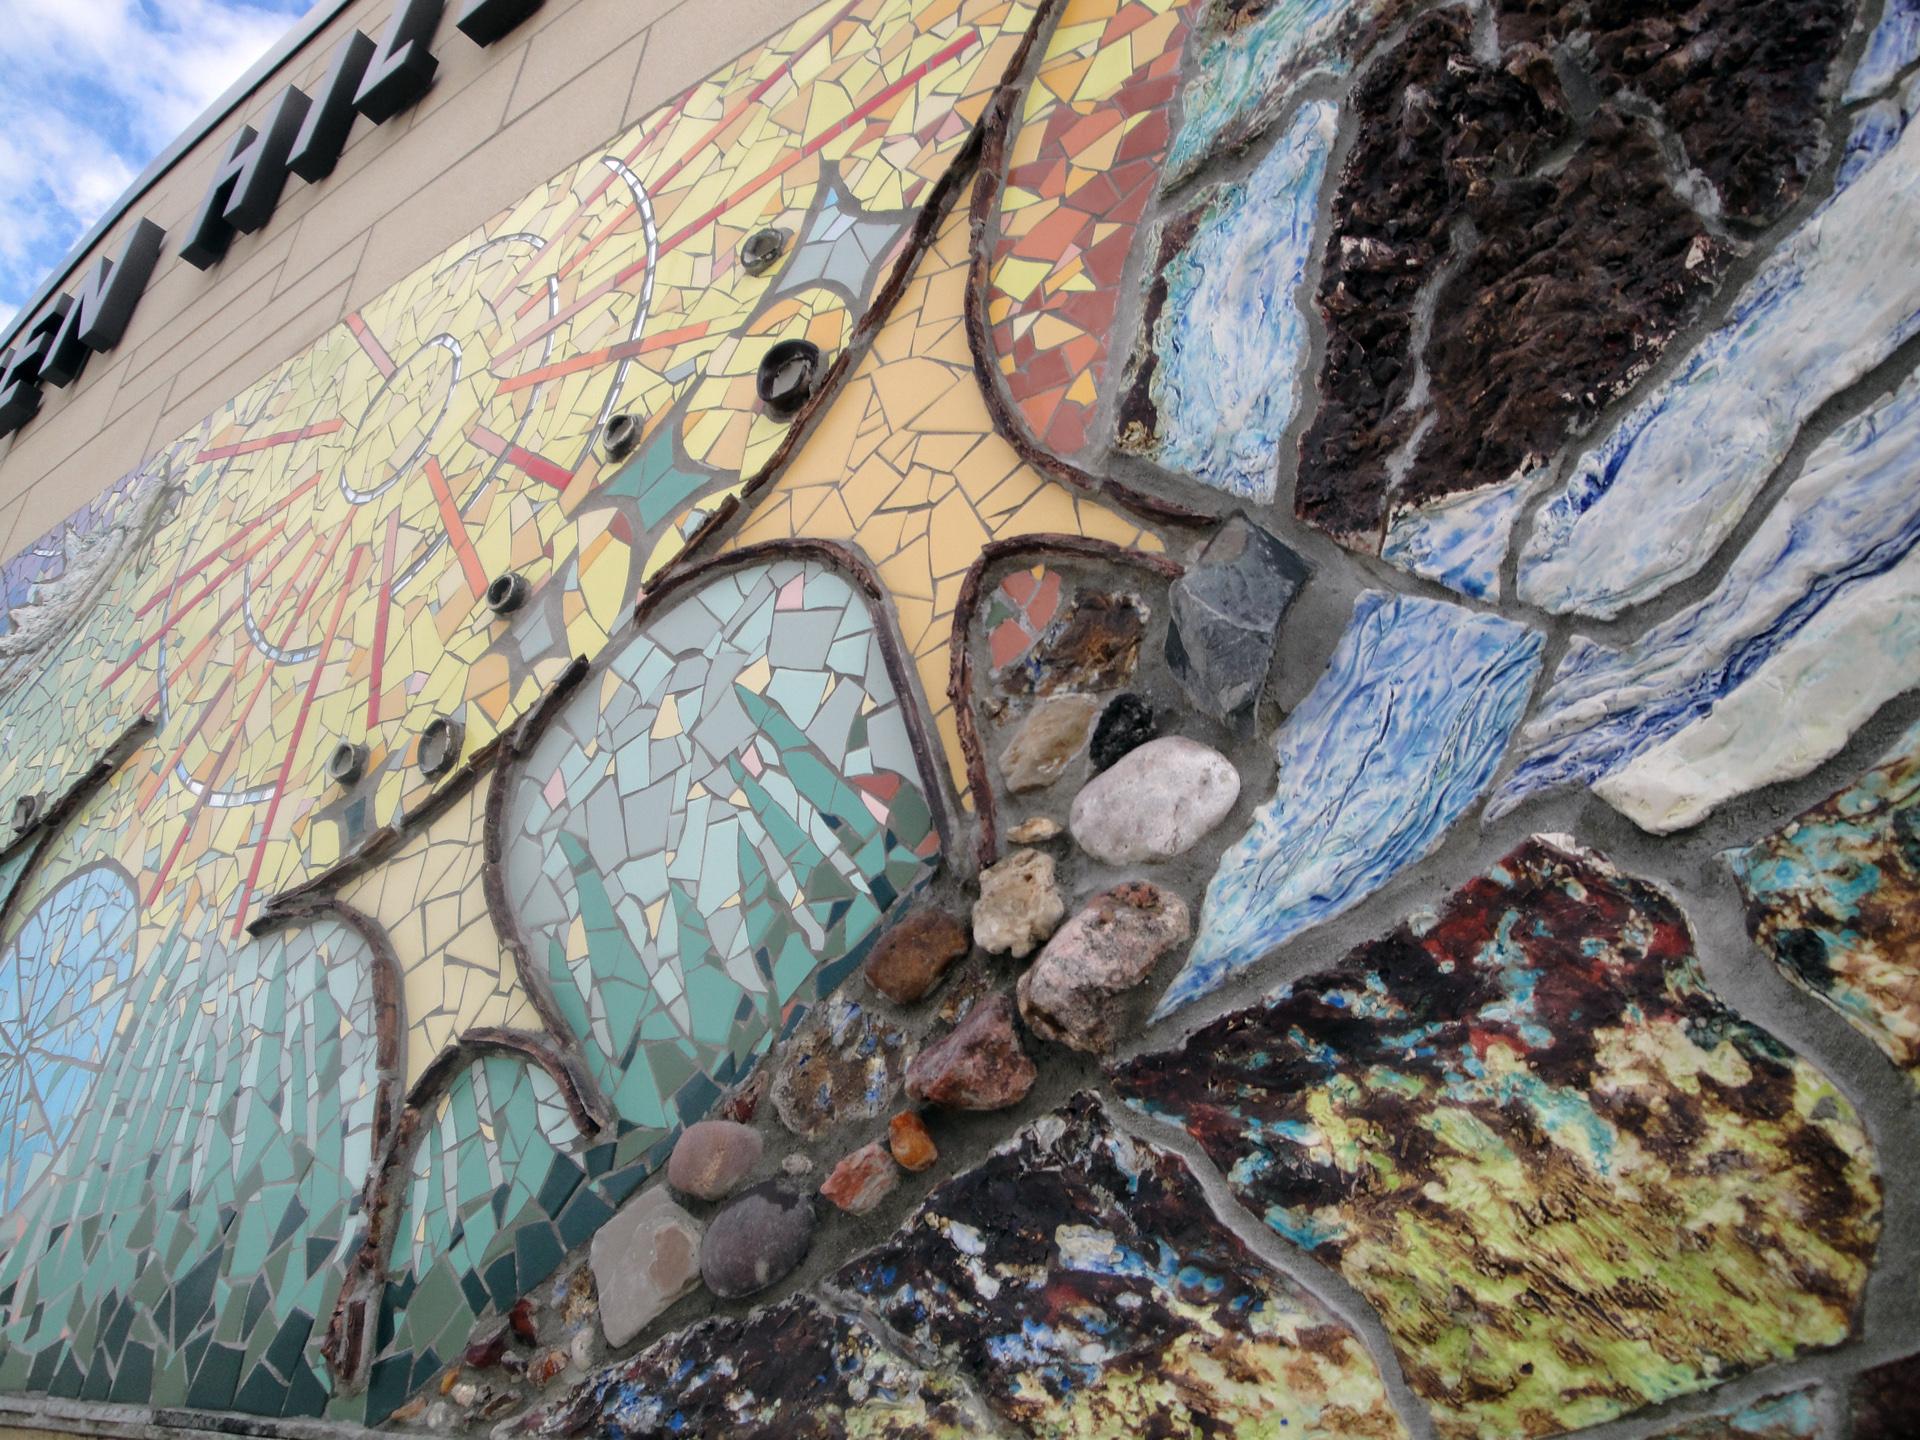 Community Wall at Green Hills Public Library, Palos Hills, IL, USA